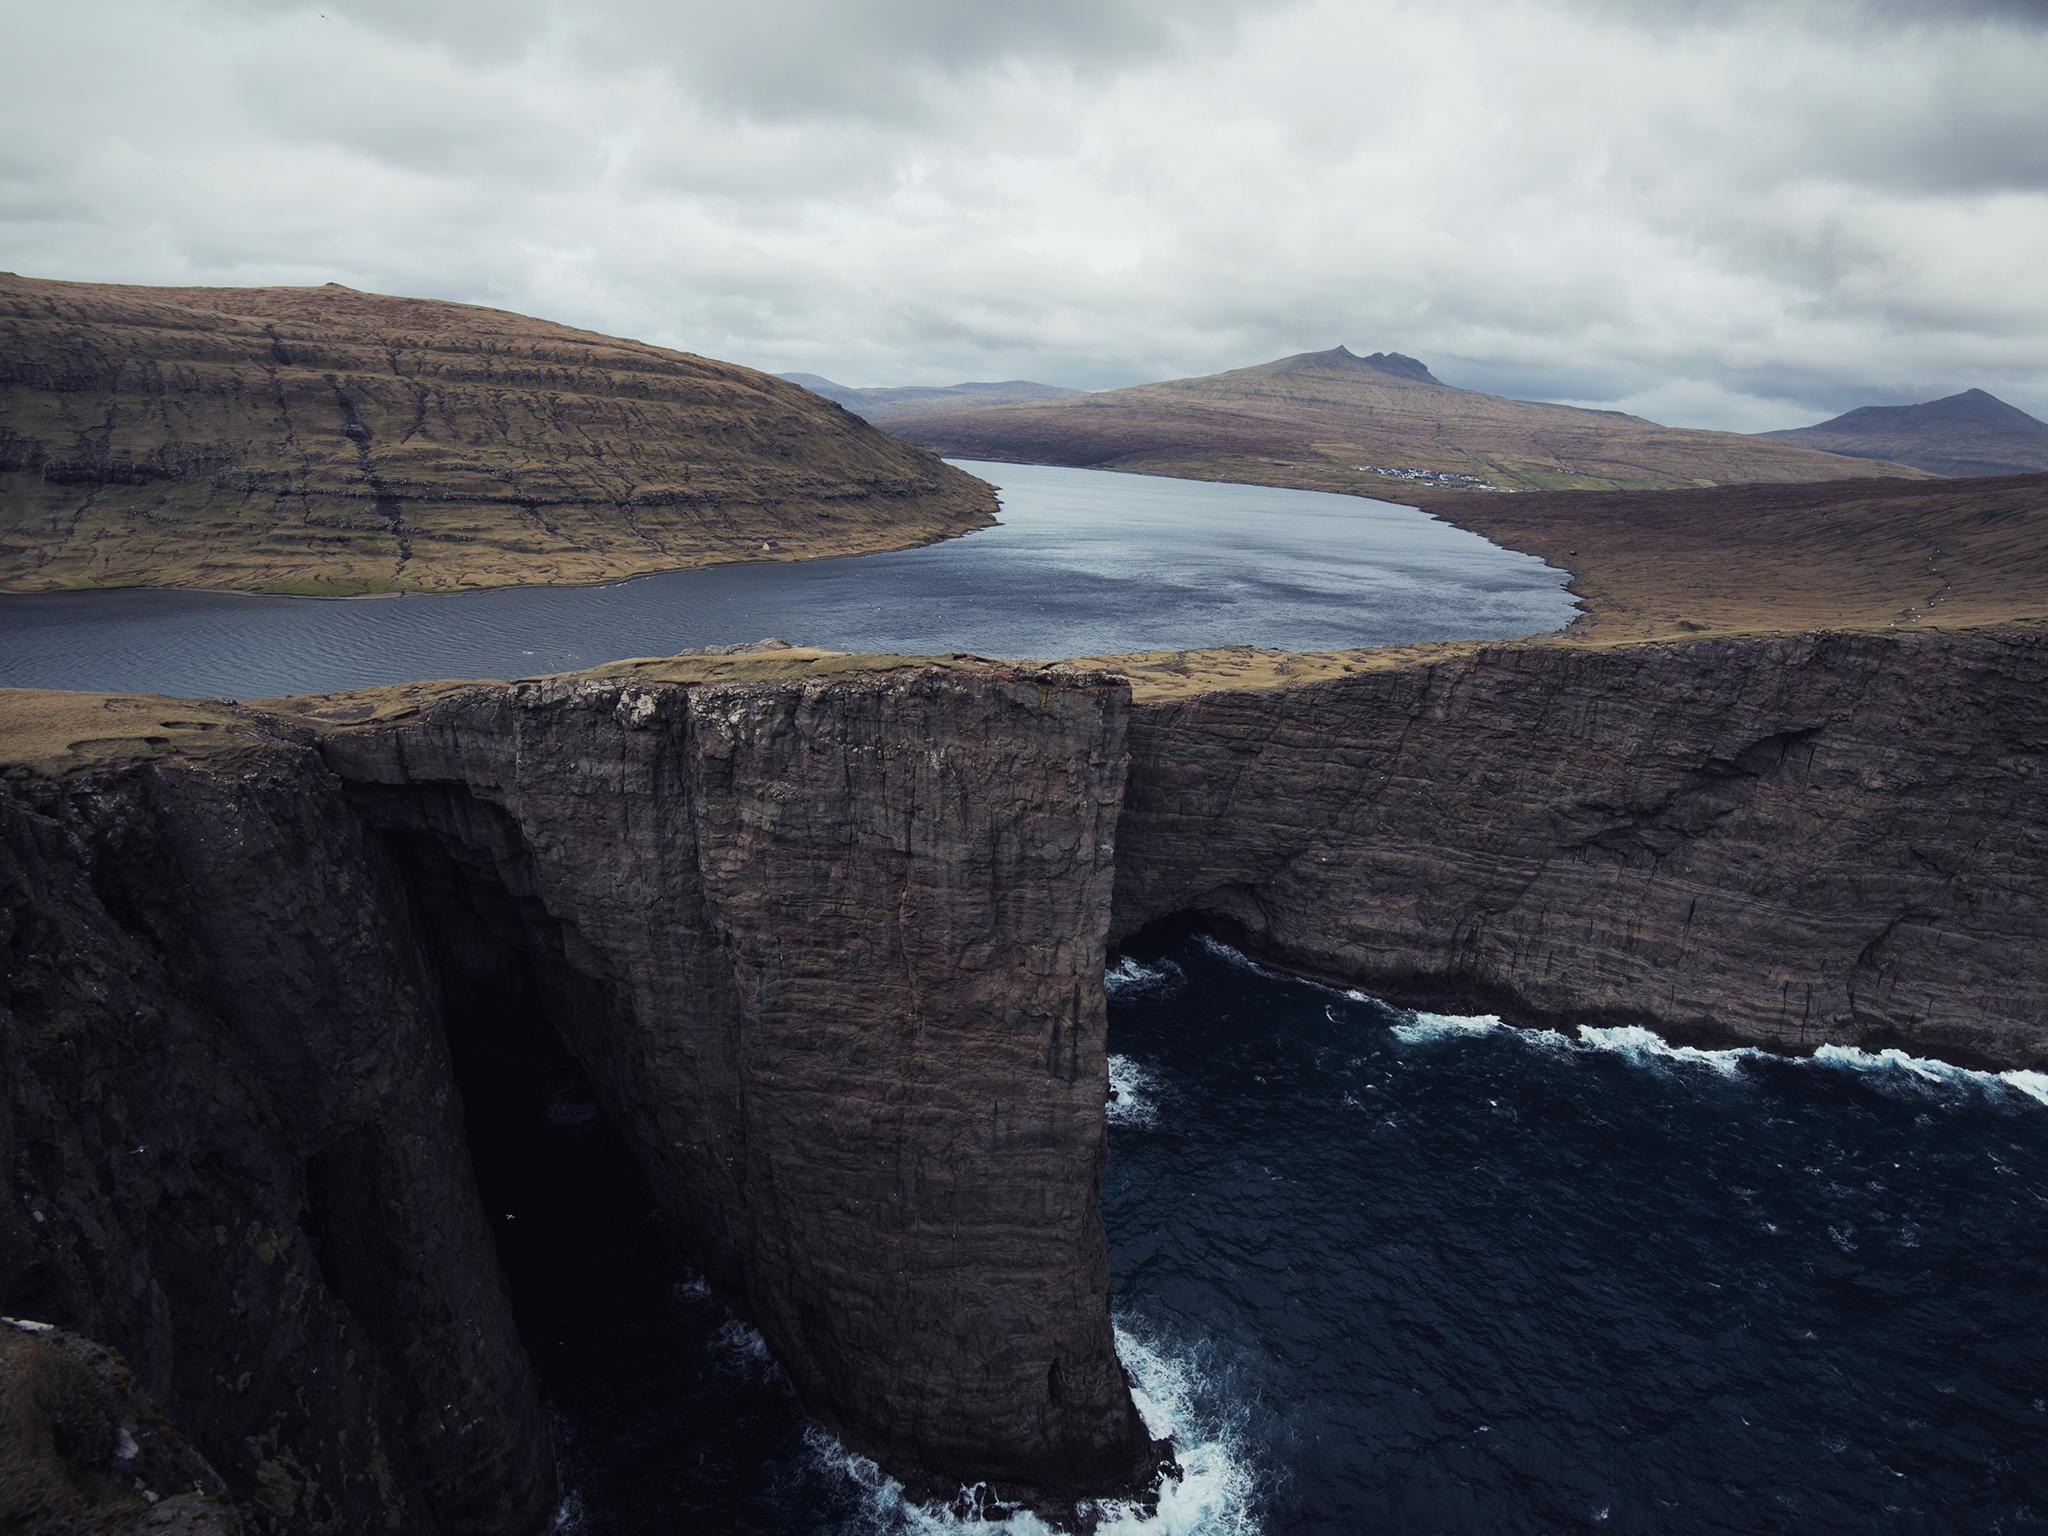 Top Spots to Visit in The Faroe Islands